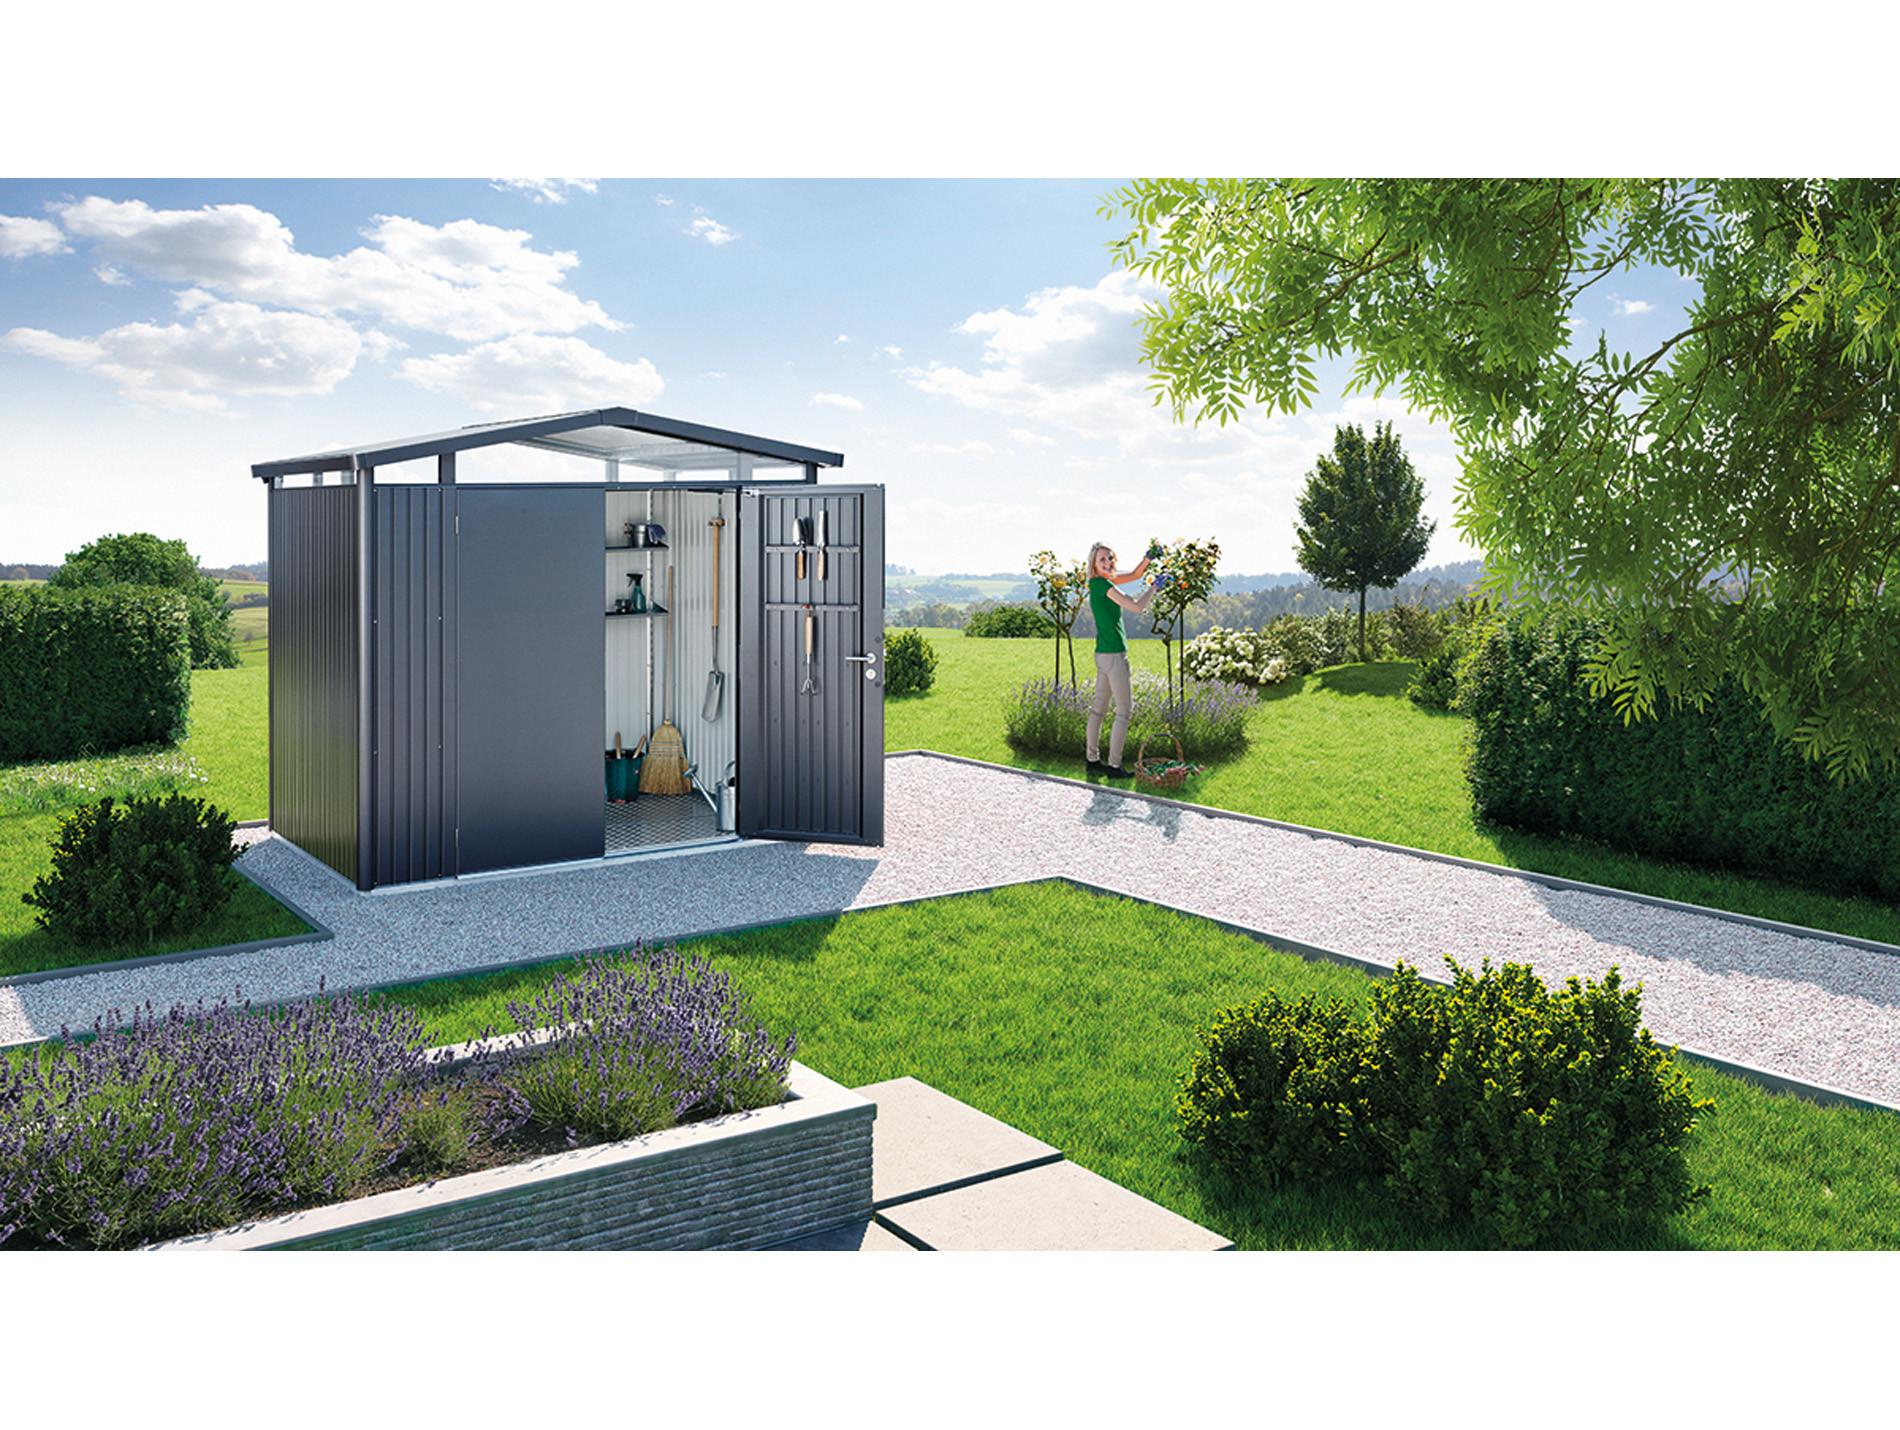 acheter pas cher 0b3d5 534fc Abri de jardin métal Panorama® 5,40 m² - Abris de jardin ...